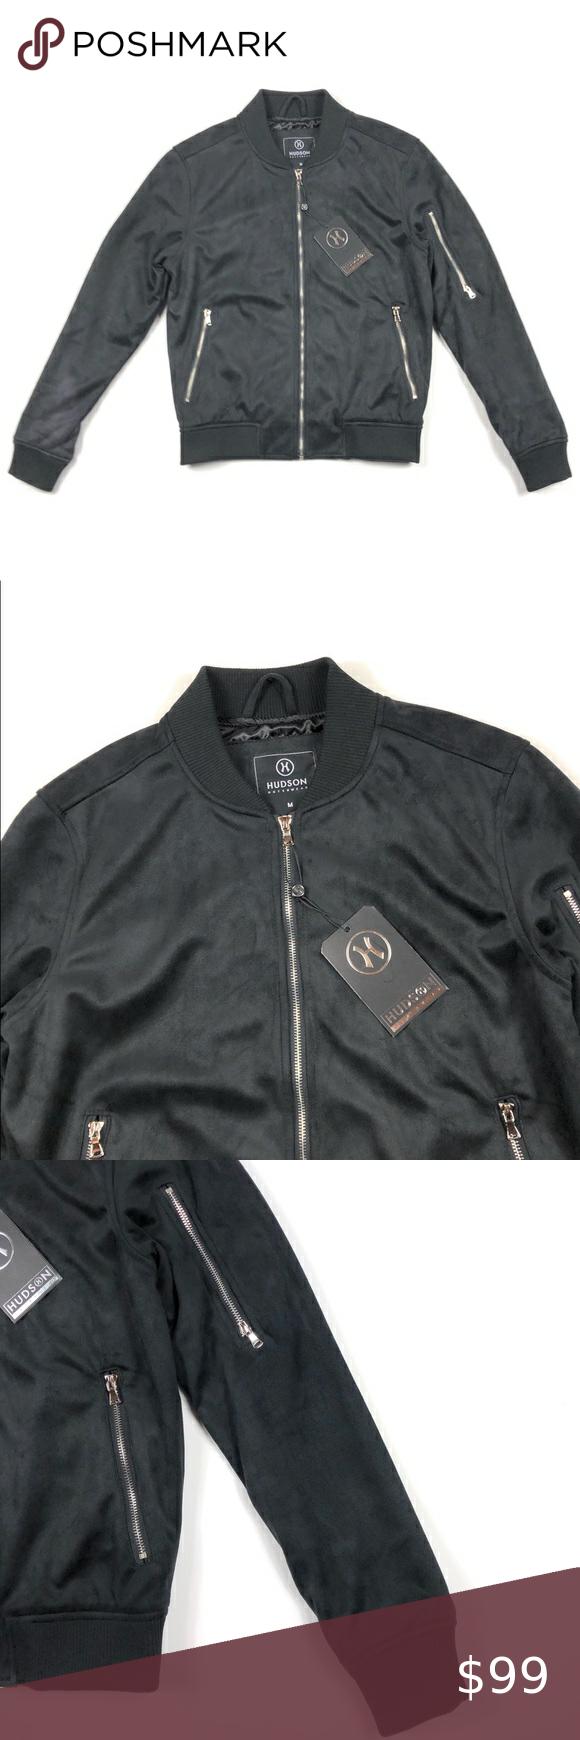 Hudson Outerwear Black Zip Up Bomber Jacket In 2020 Black Zip Ups Outerwear Bomber Jacket [ 1740 x 580 Pixel ]